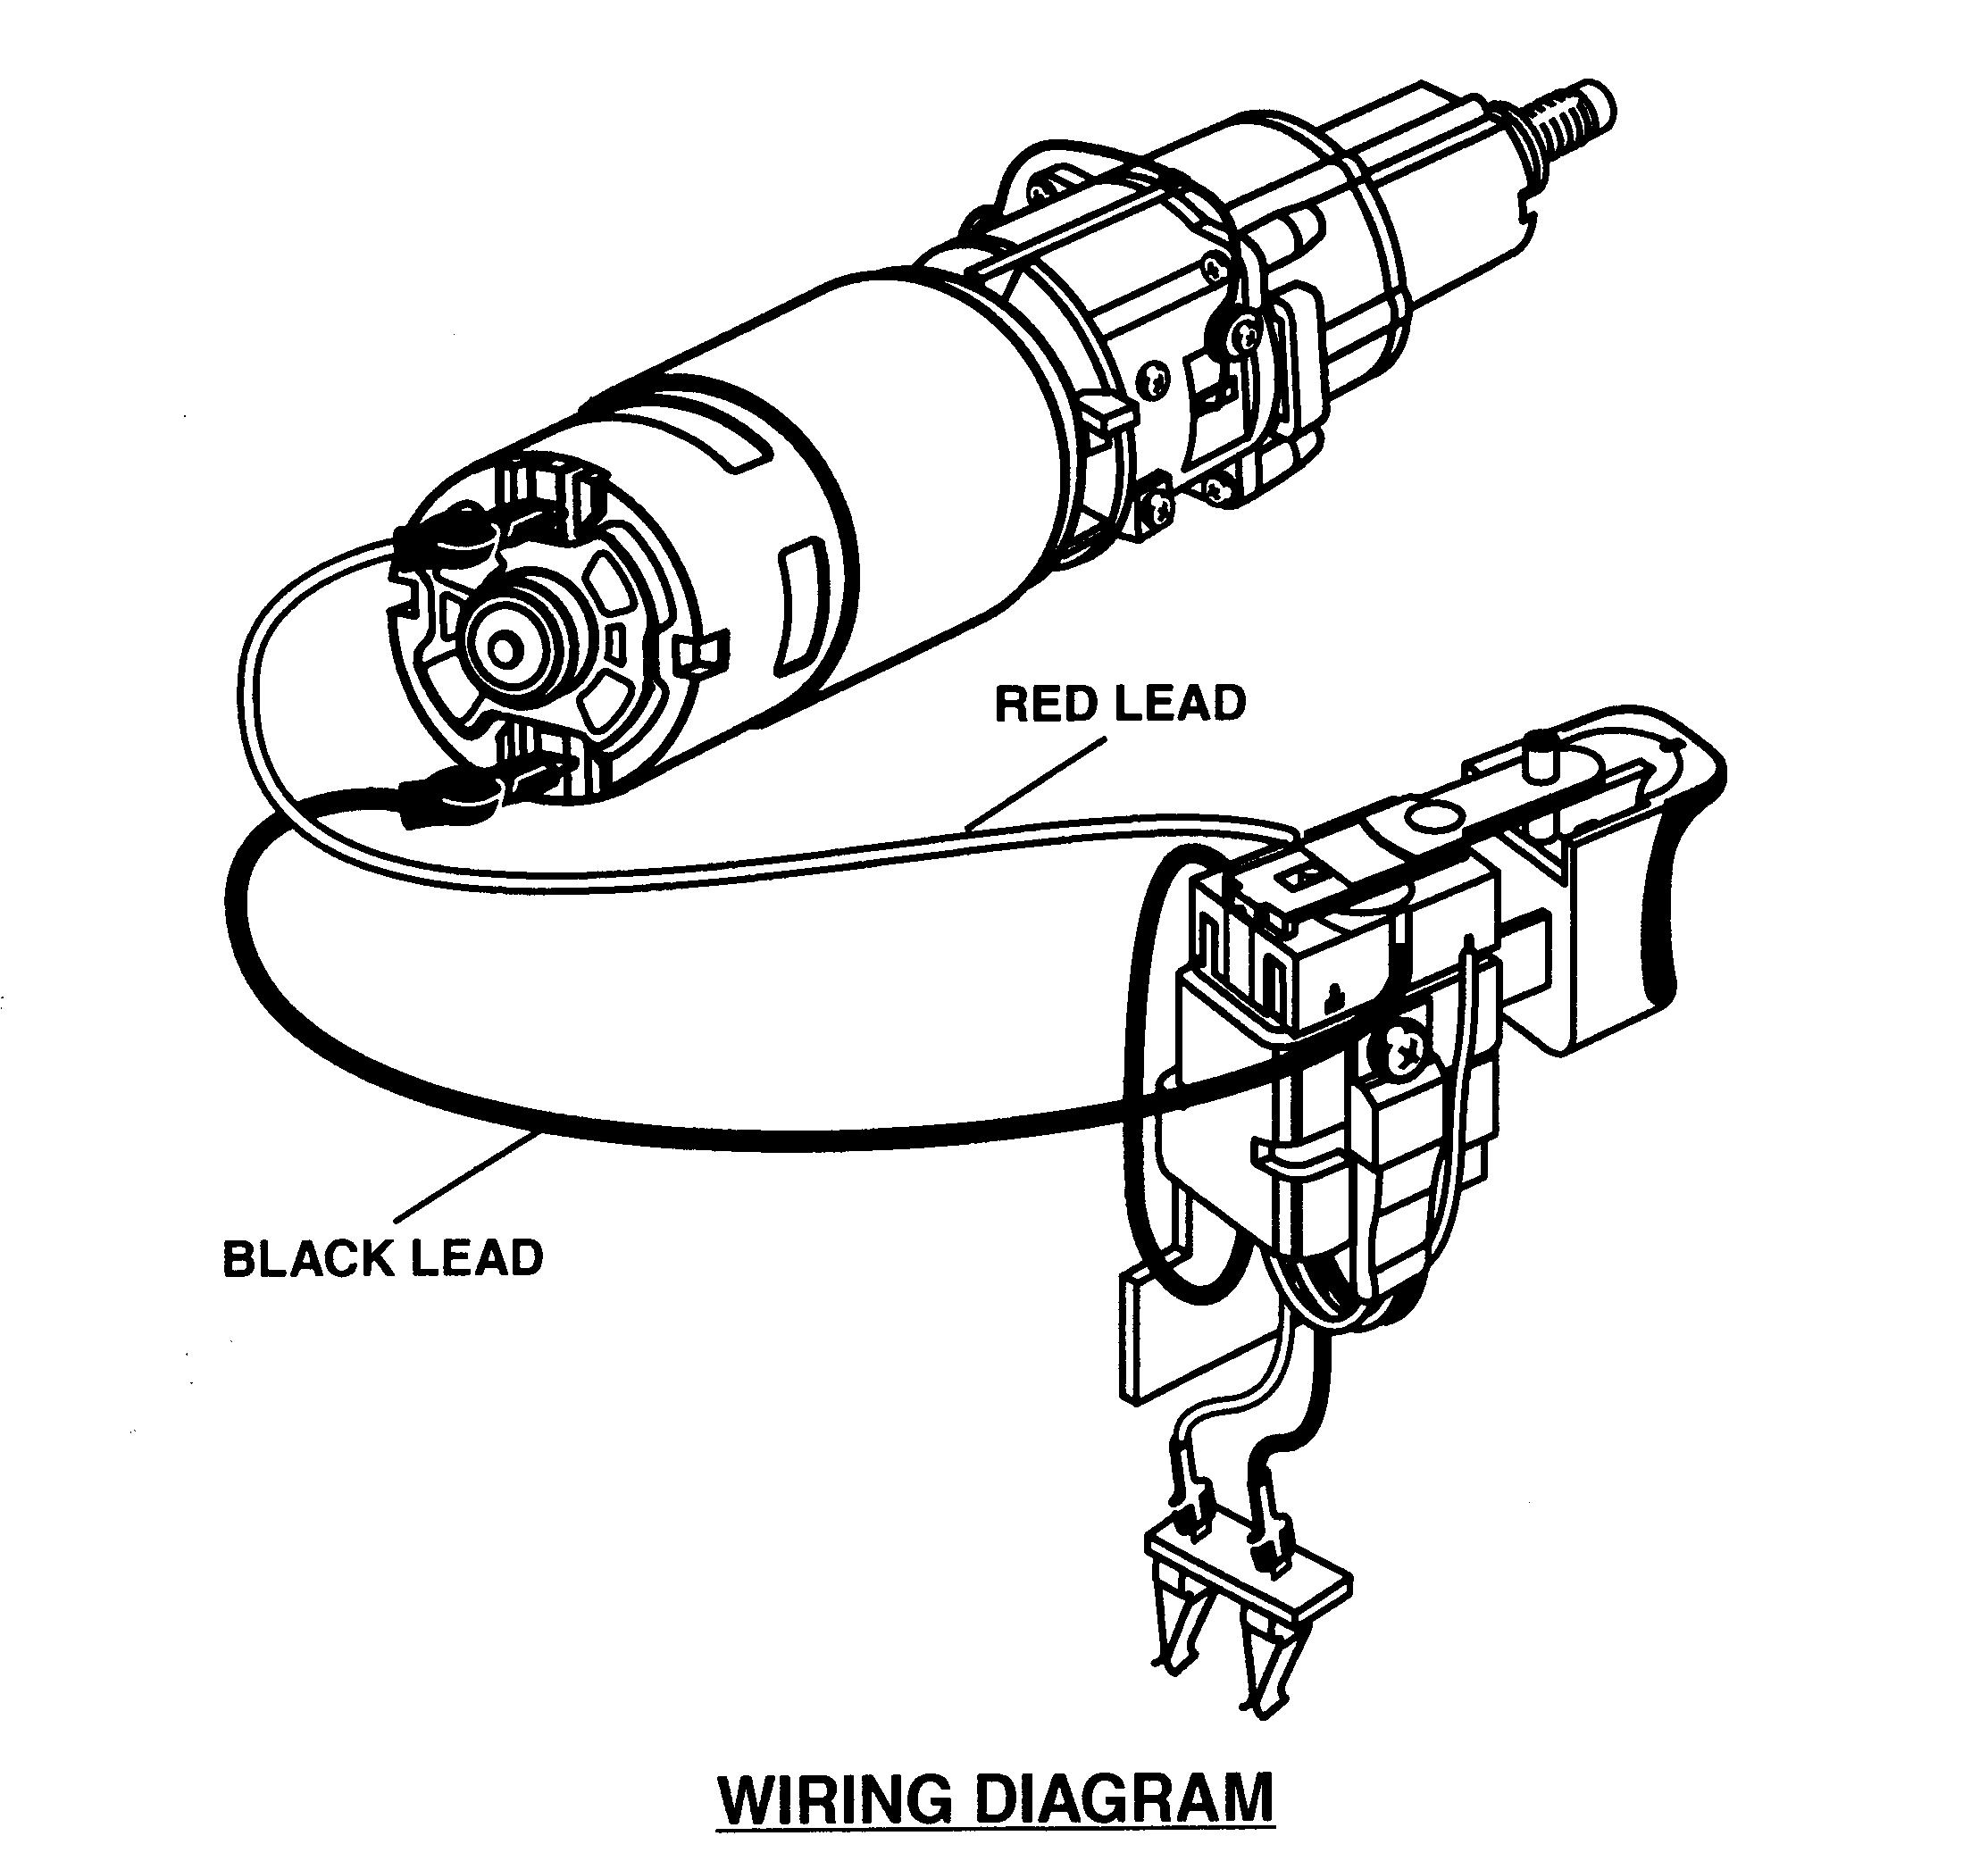 1961 dodge pickup truck wiring diagram